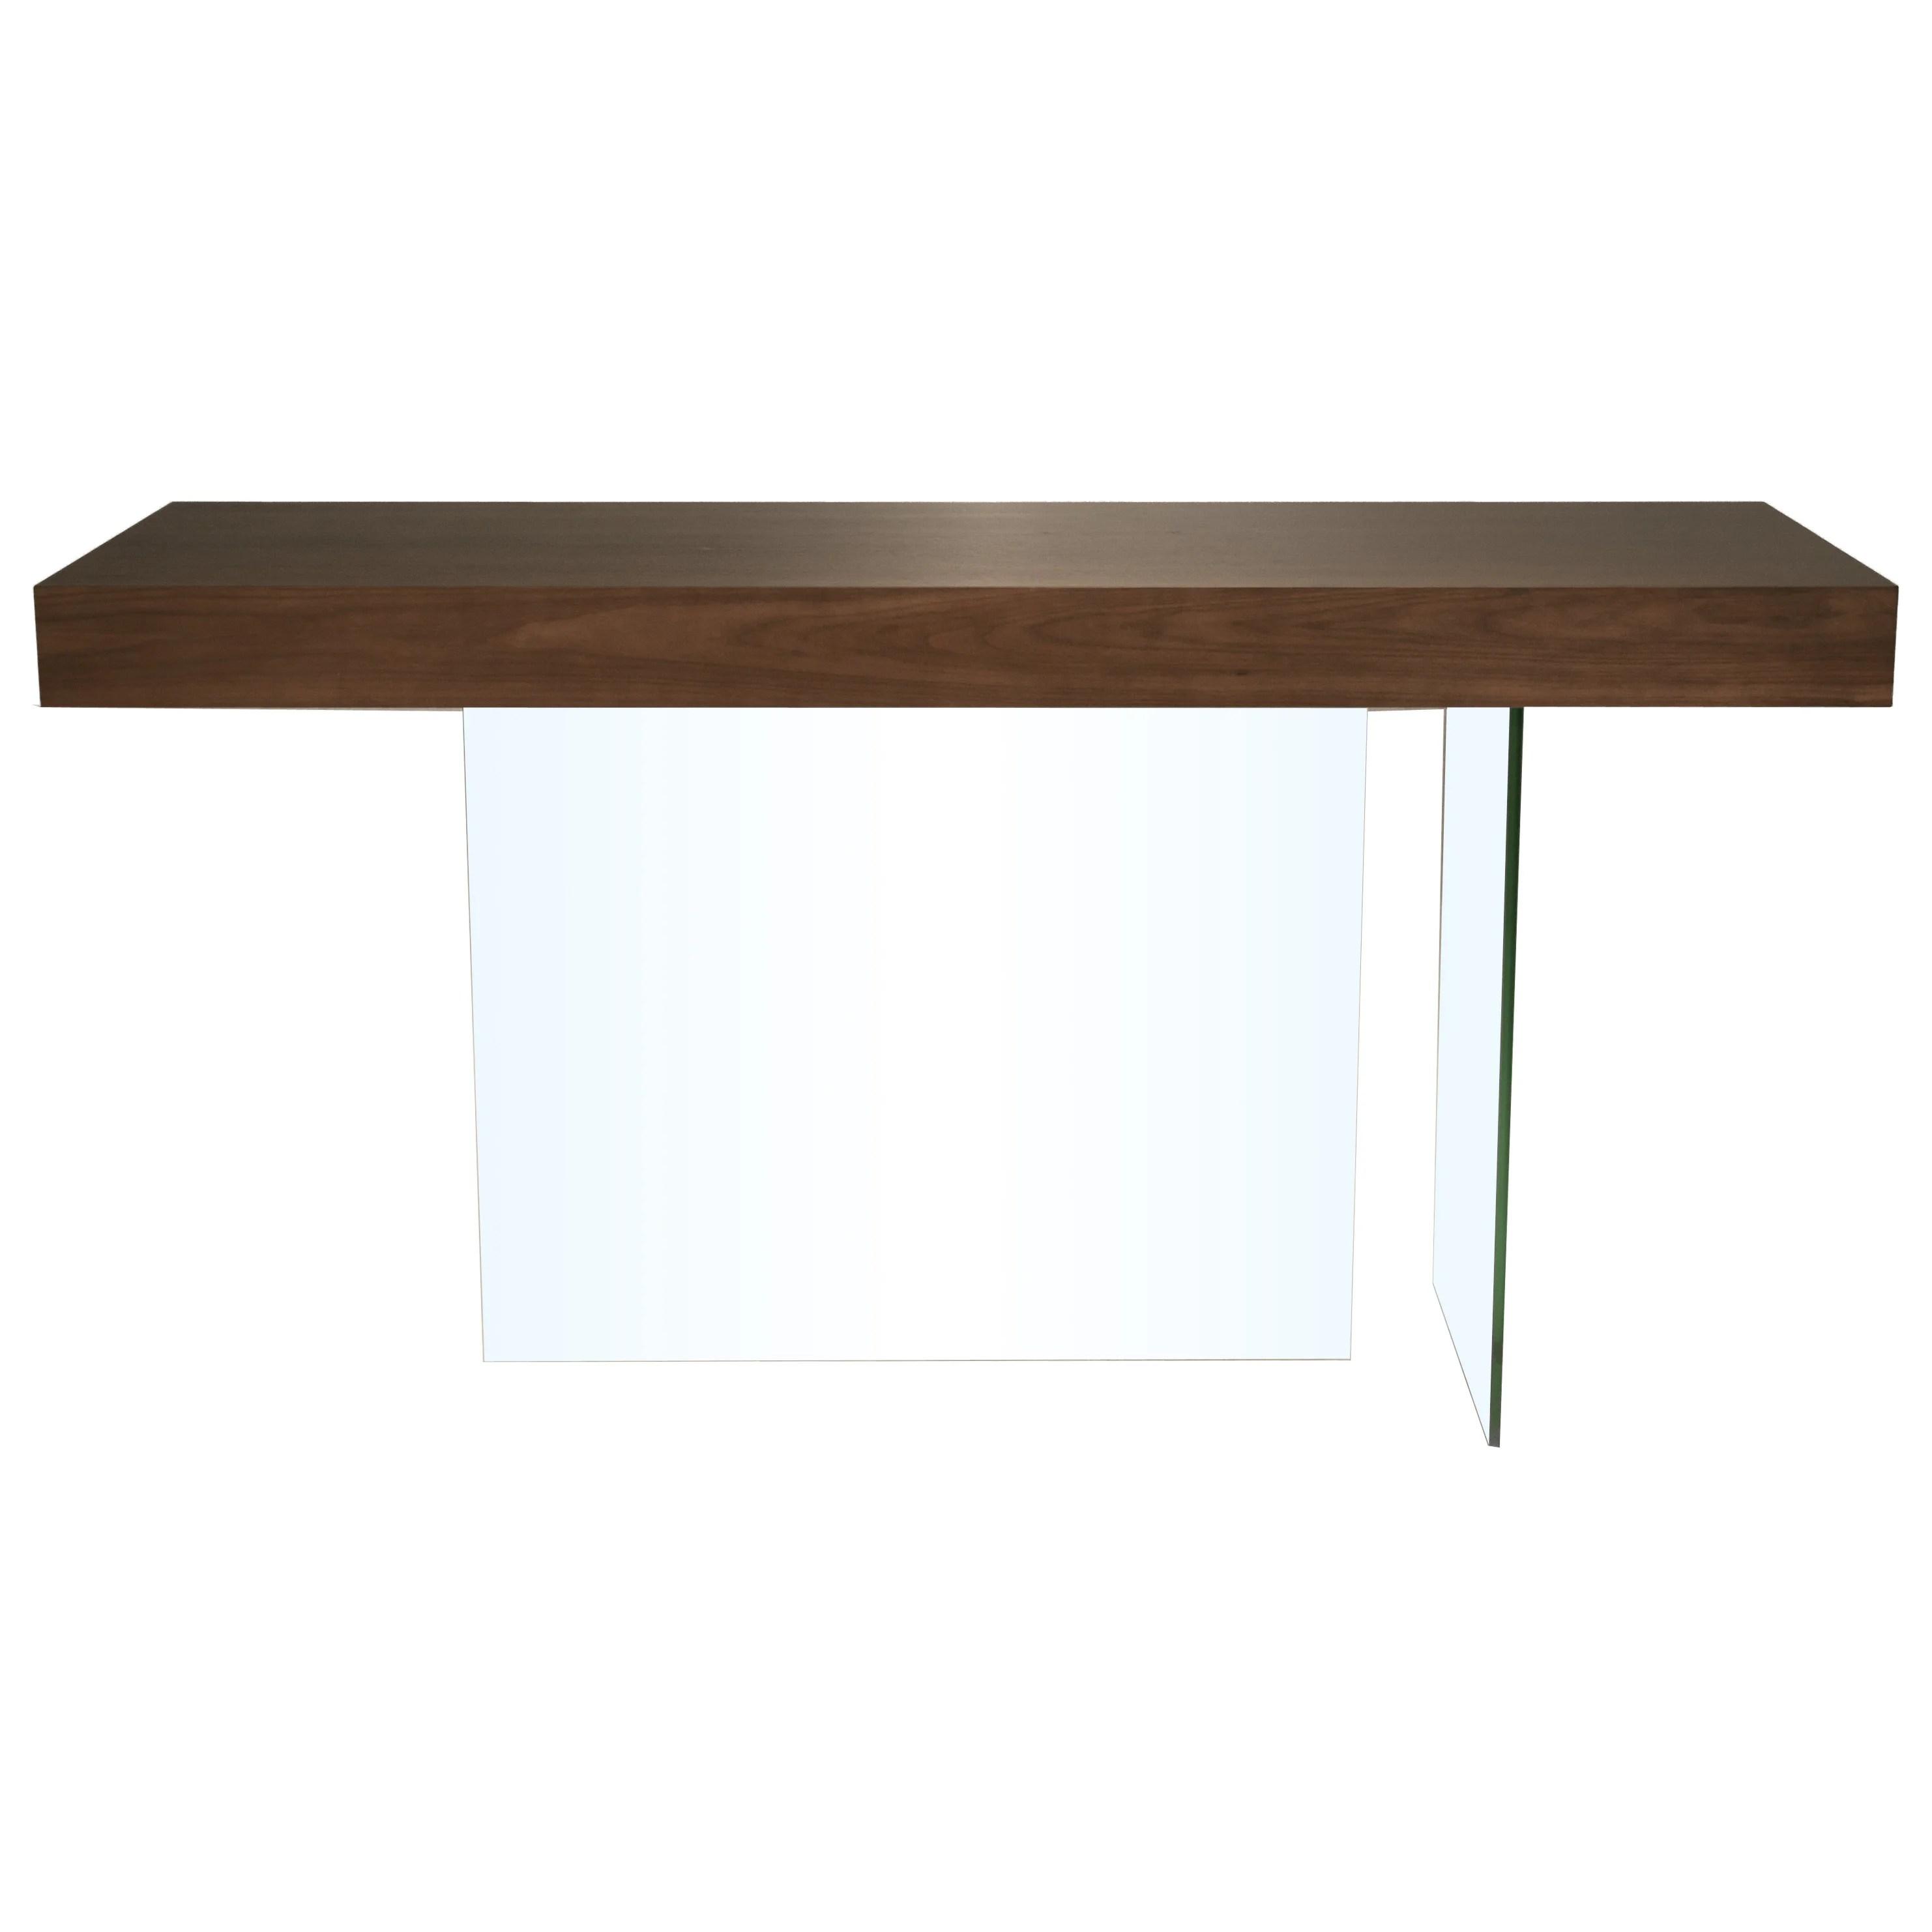 star furniture sofa table com bluebell legs international blain console and reviews wayfair